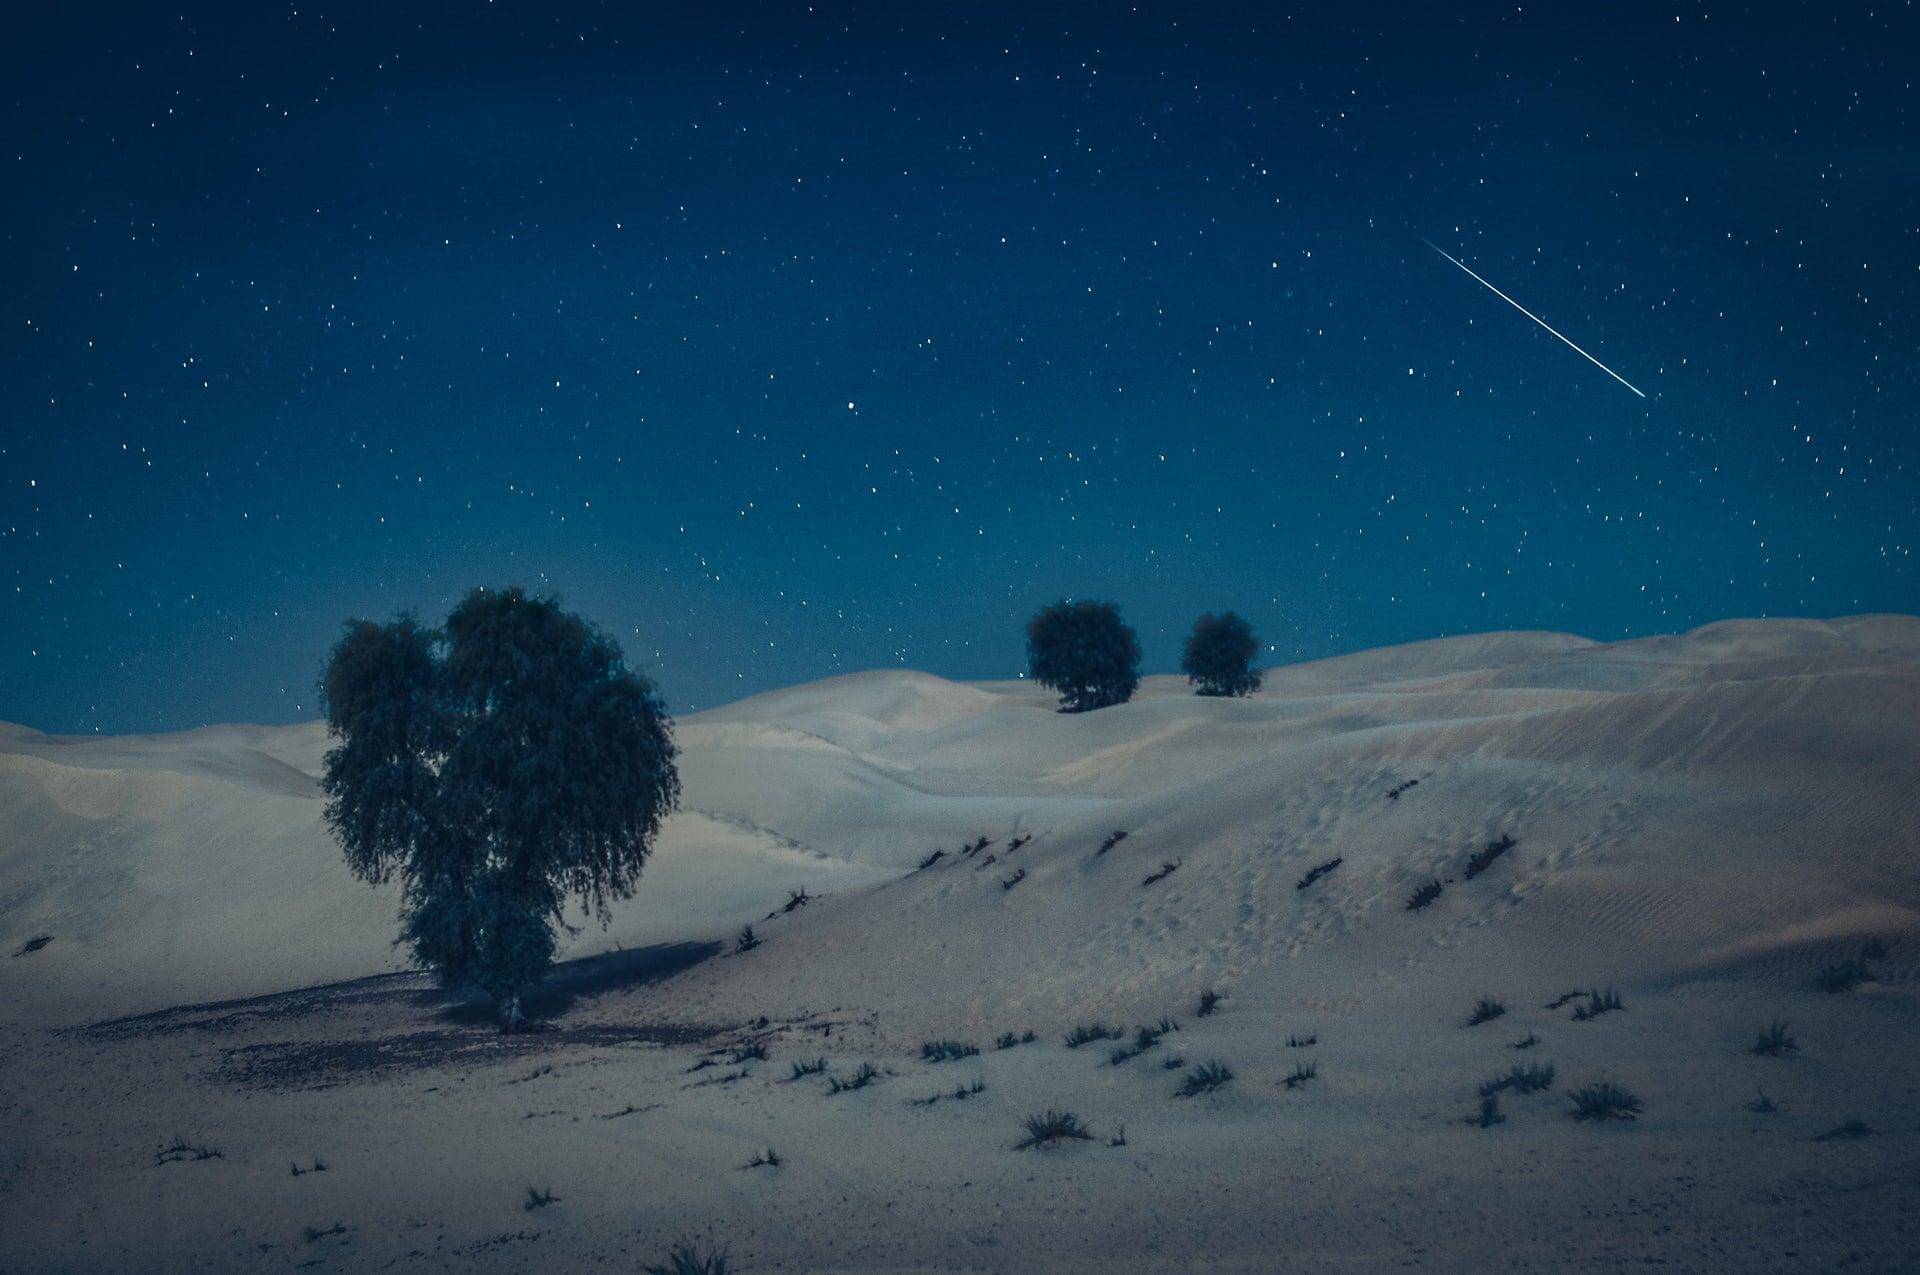 A shooting star in a night scene over the Arabian Desert